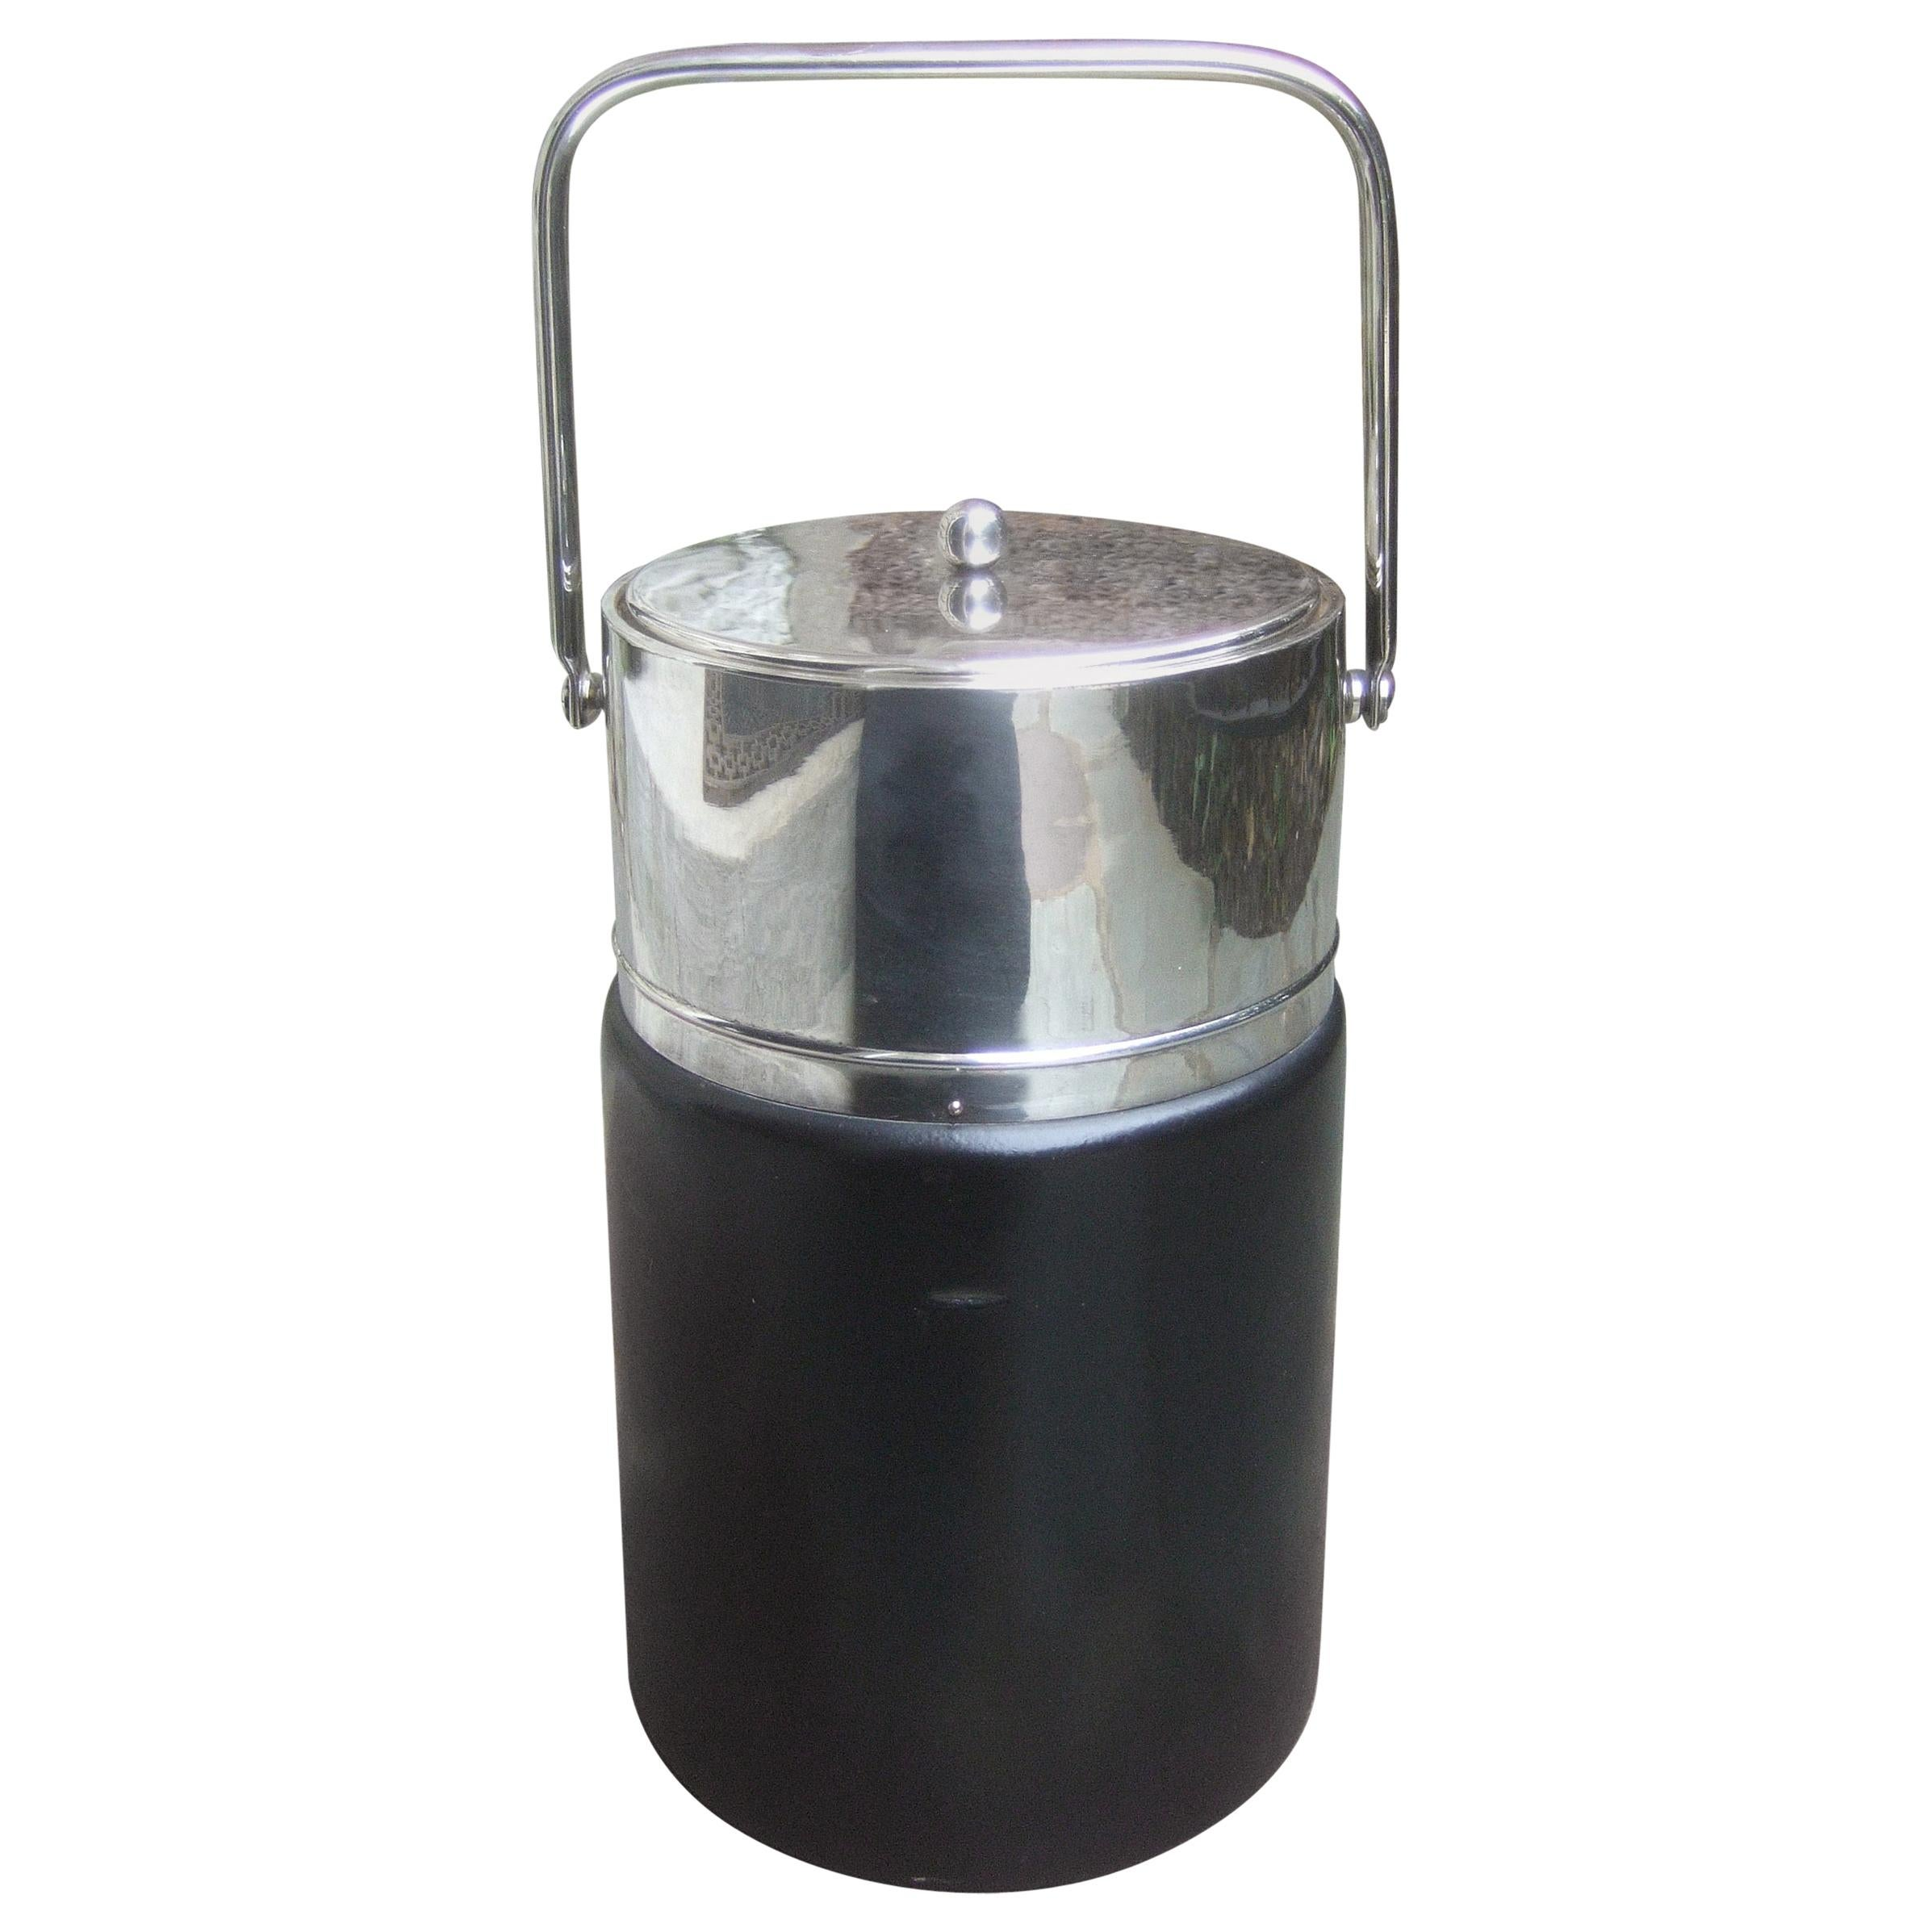 Gucci Italy Sleek Chrome Black Leather Ice Bucket c 1970s